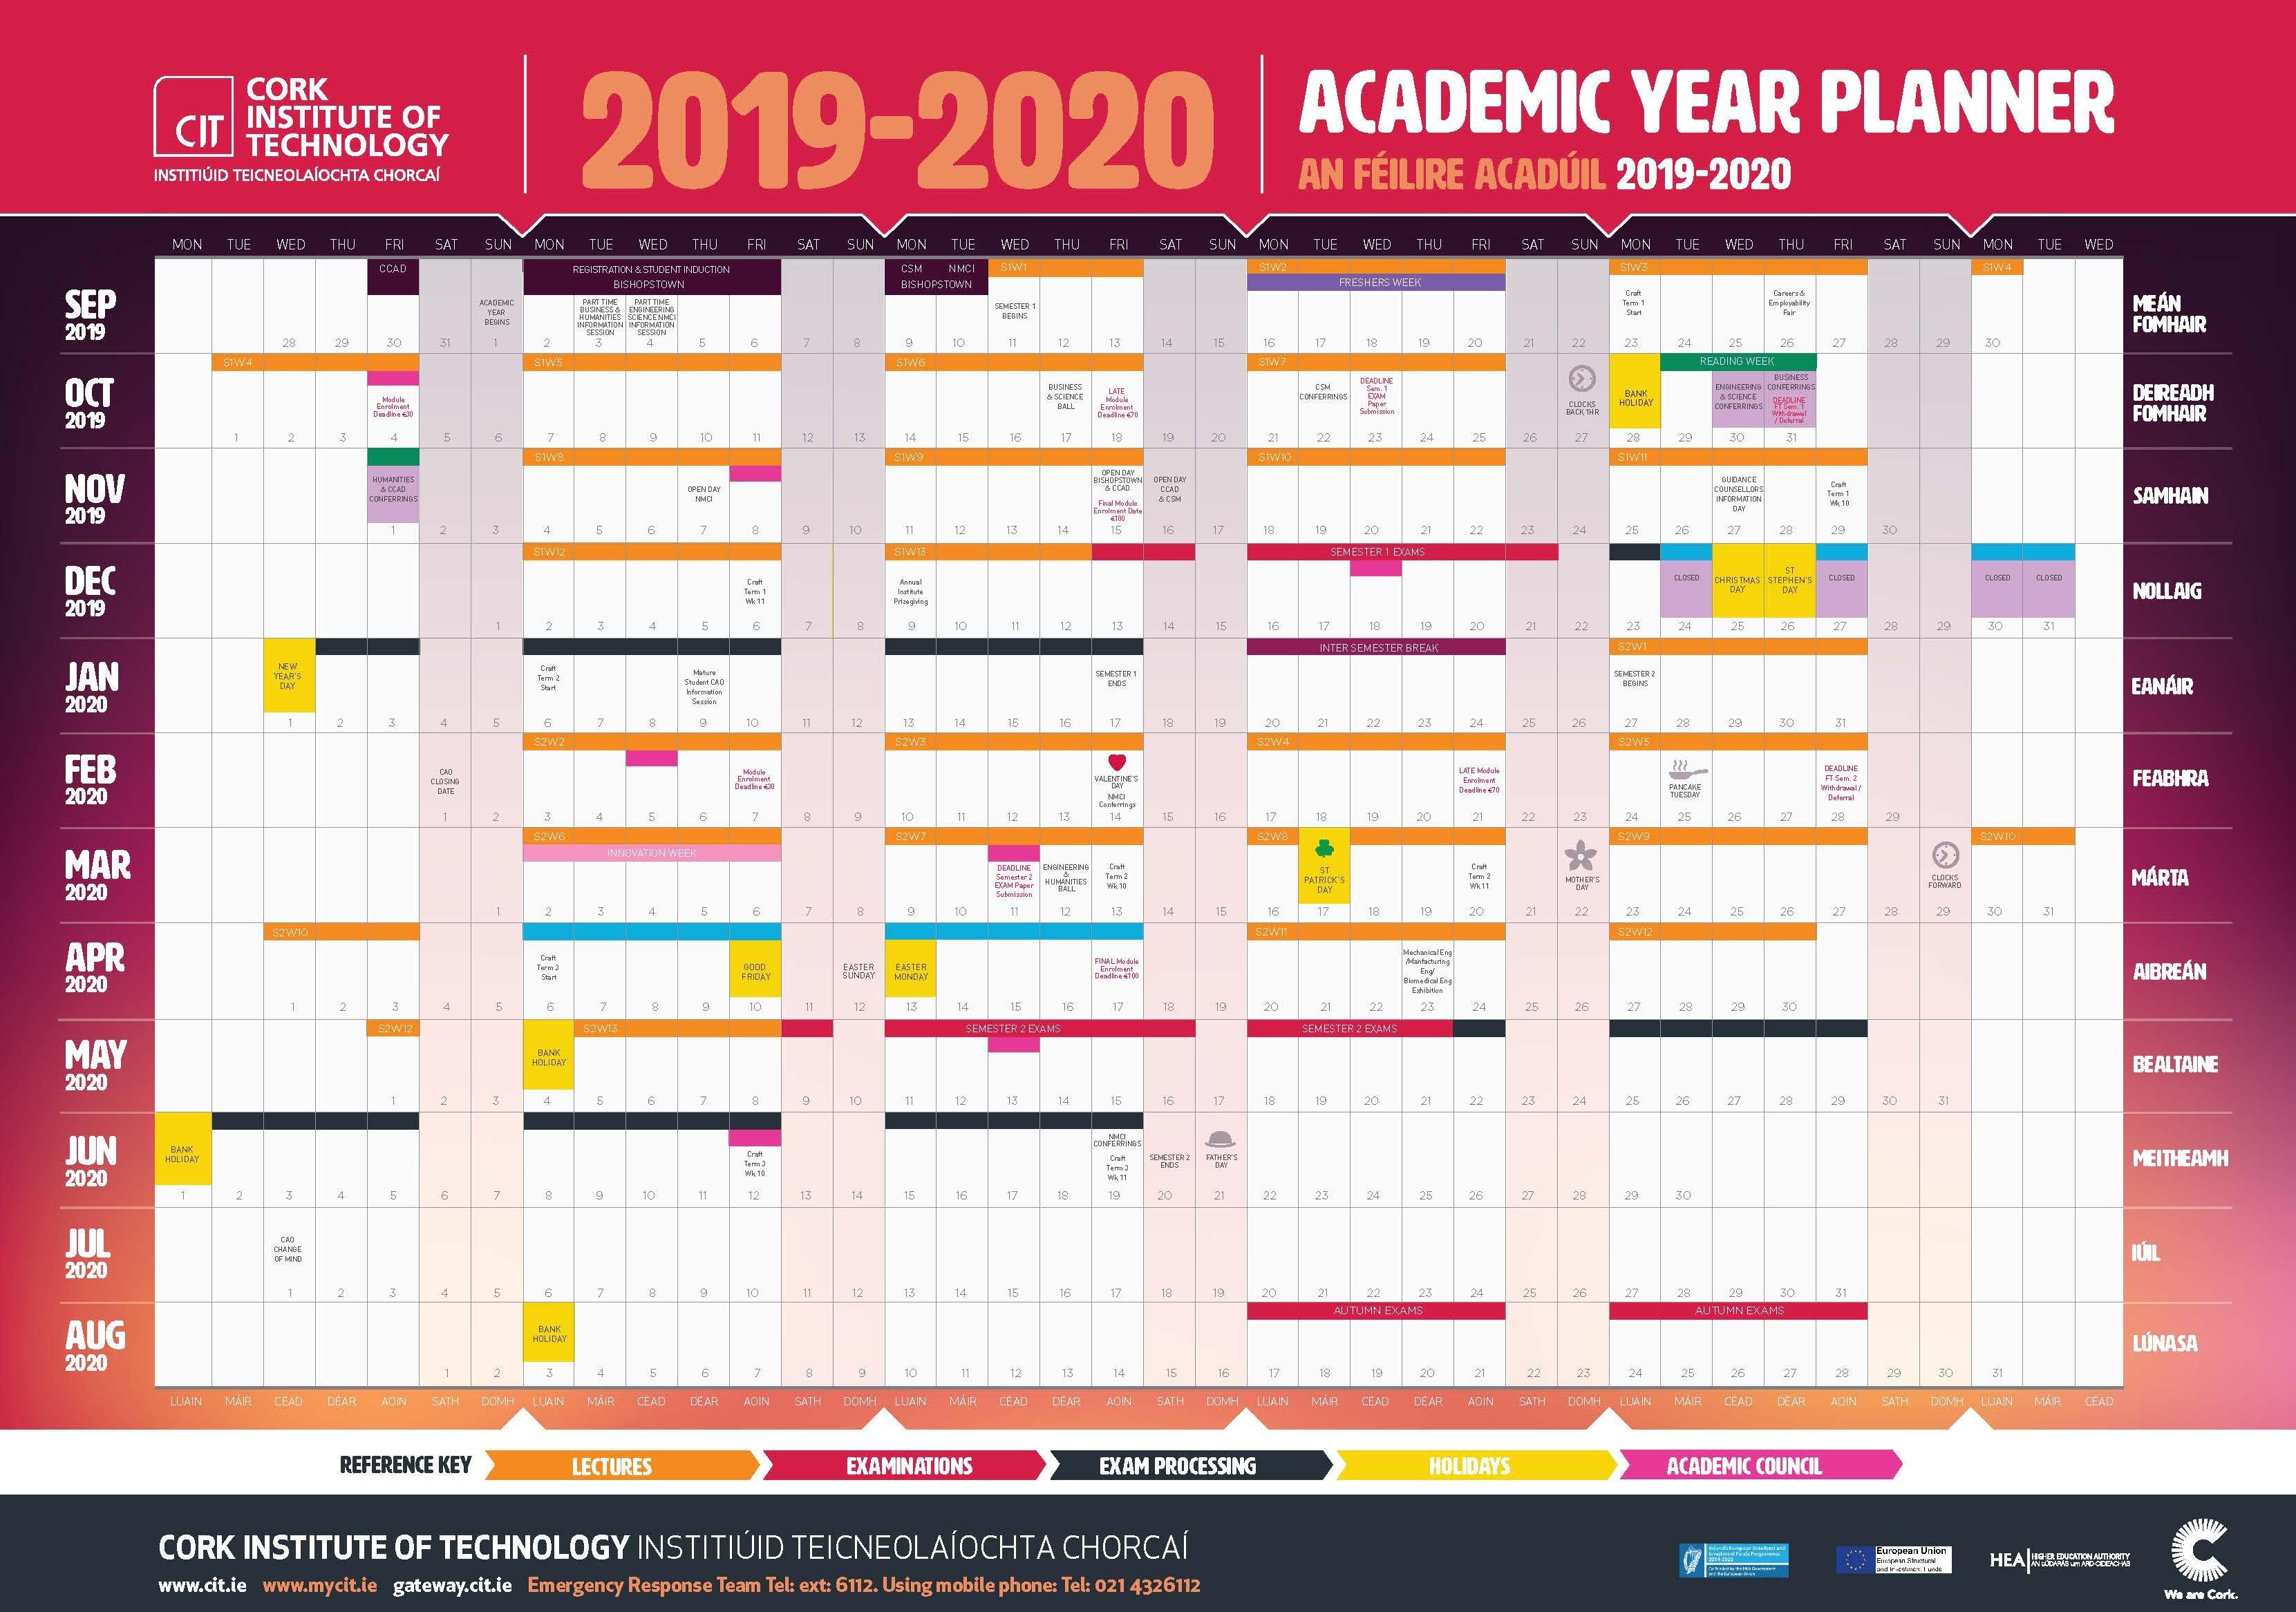 Cit – Cork Institute Of Technology – Semester Dates And Calendar Hr Calendar For The Year